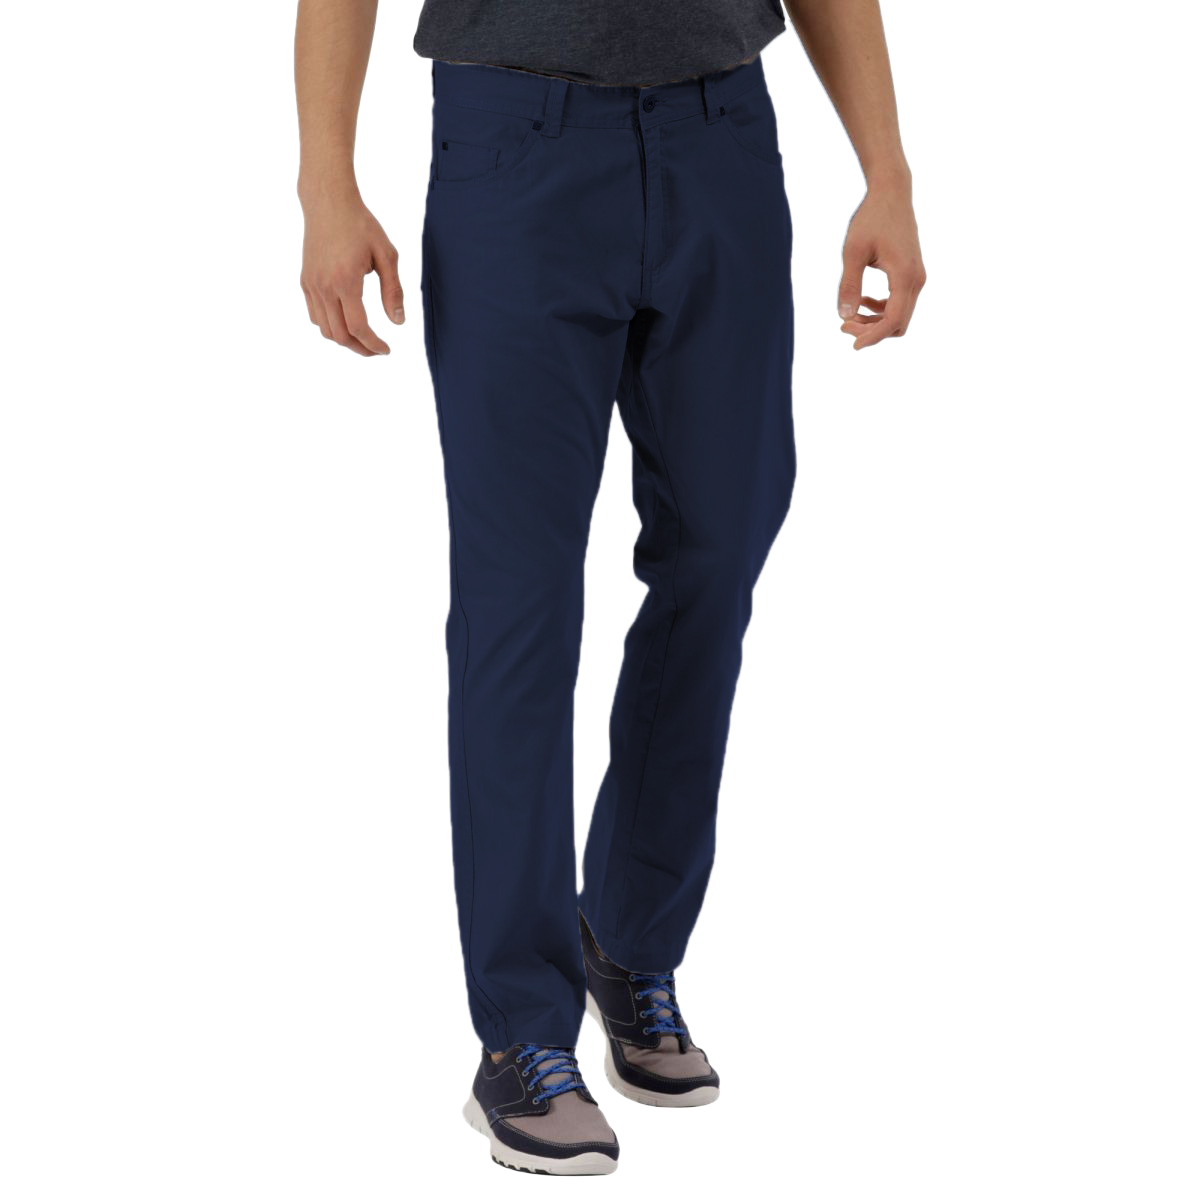 Regatta-Great-Outdoors-Pantalones-estilo-casual-modelo-Landyn-para-RG2413